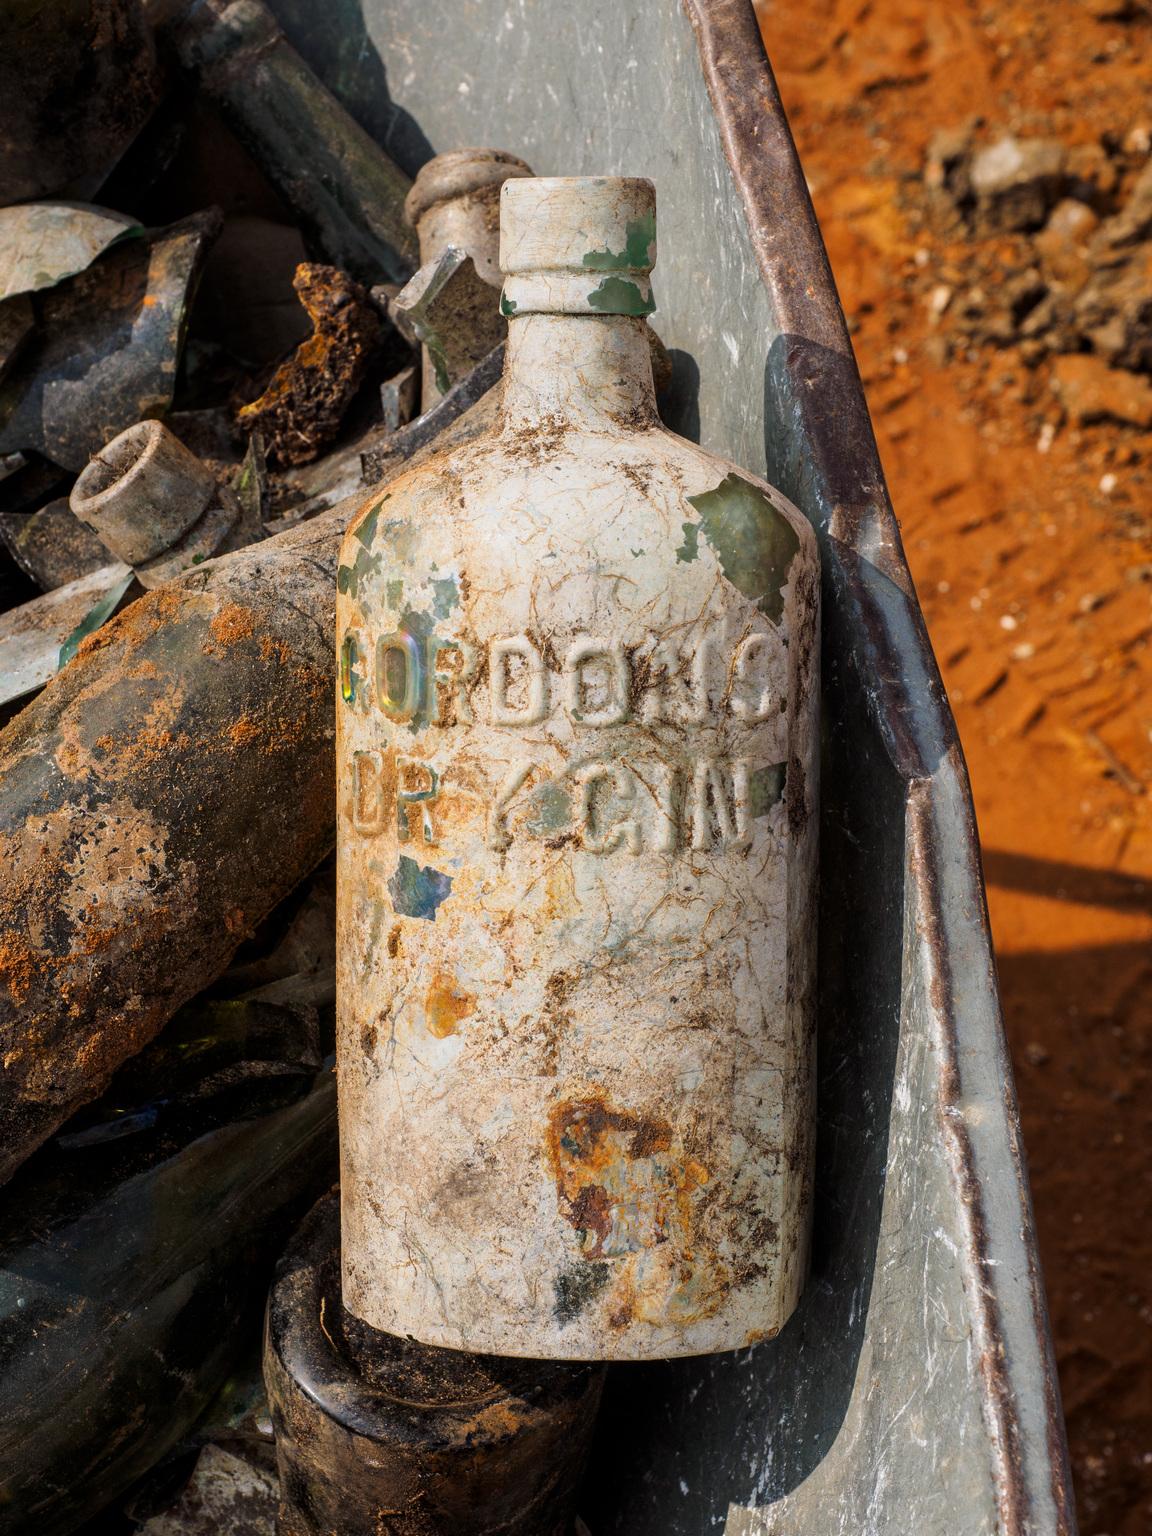 Botella de Gordon's